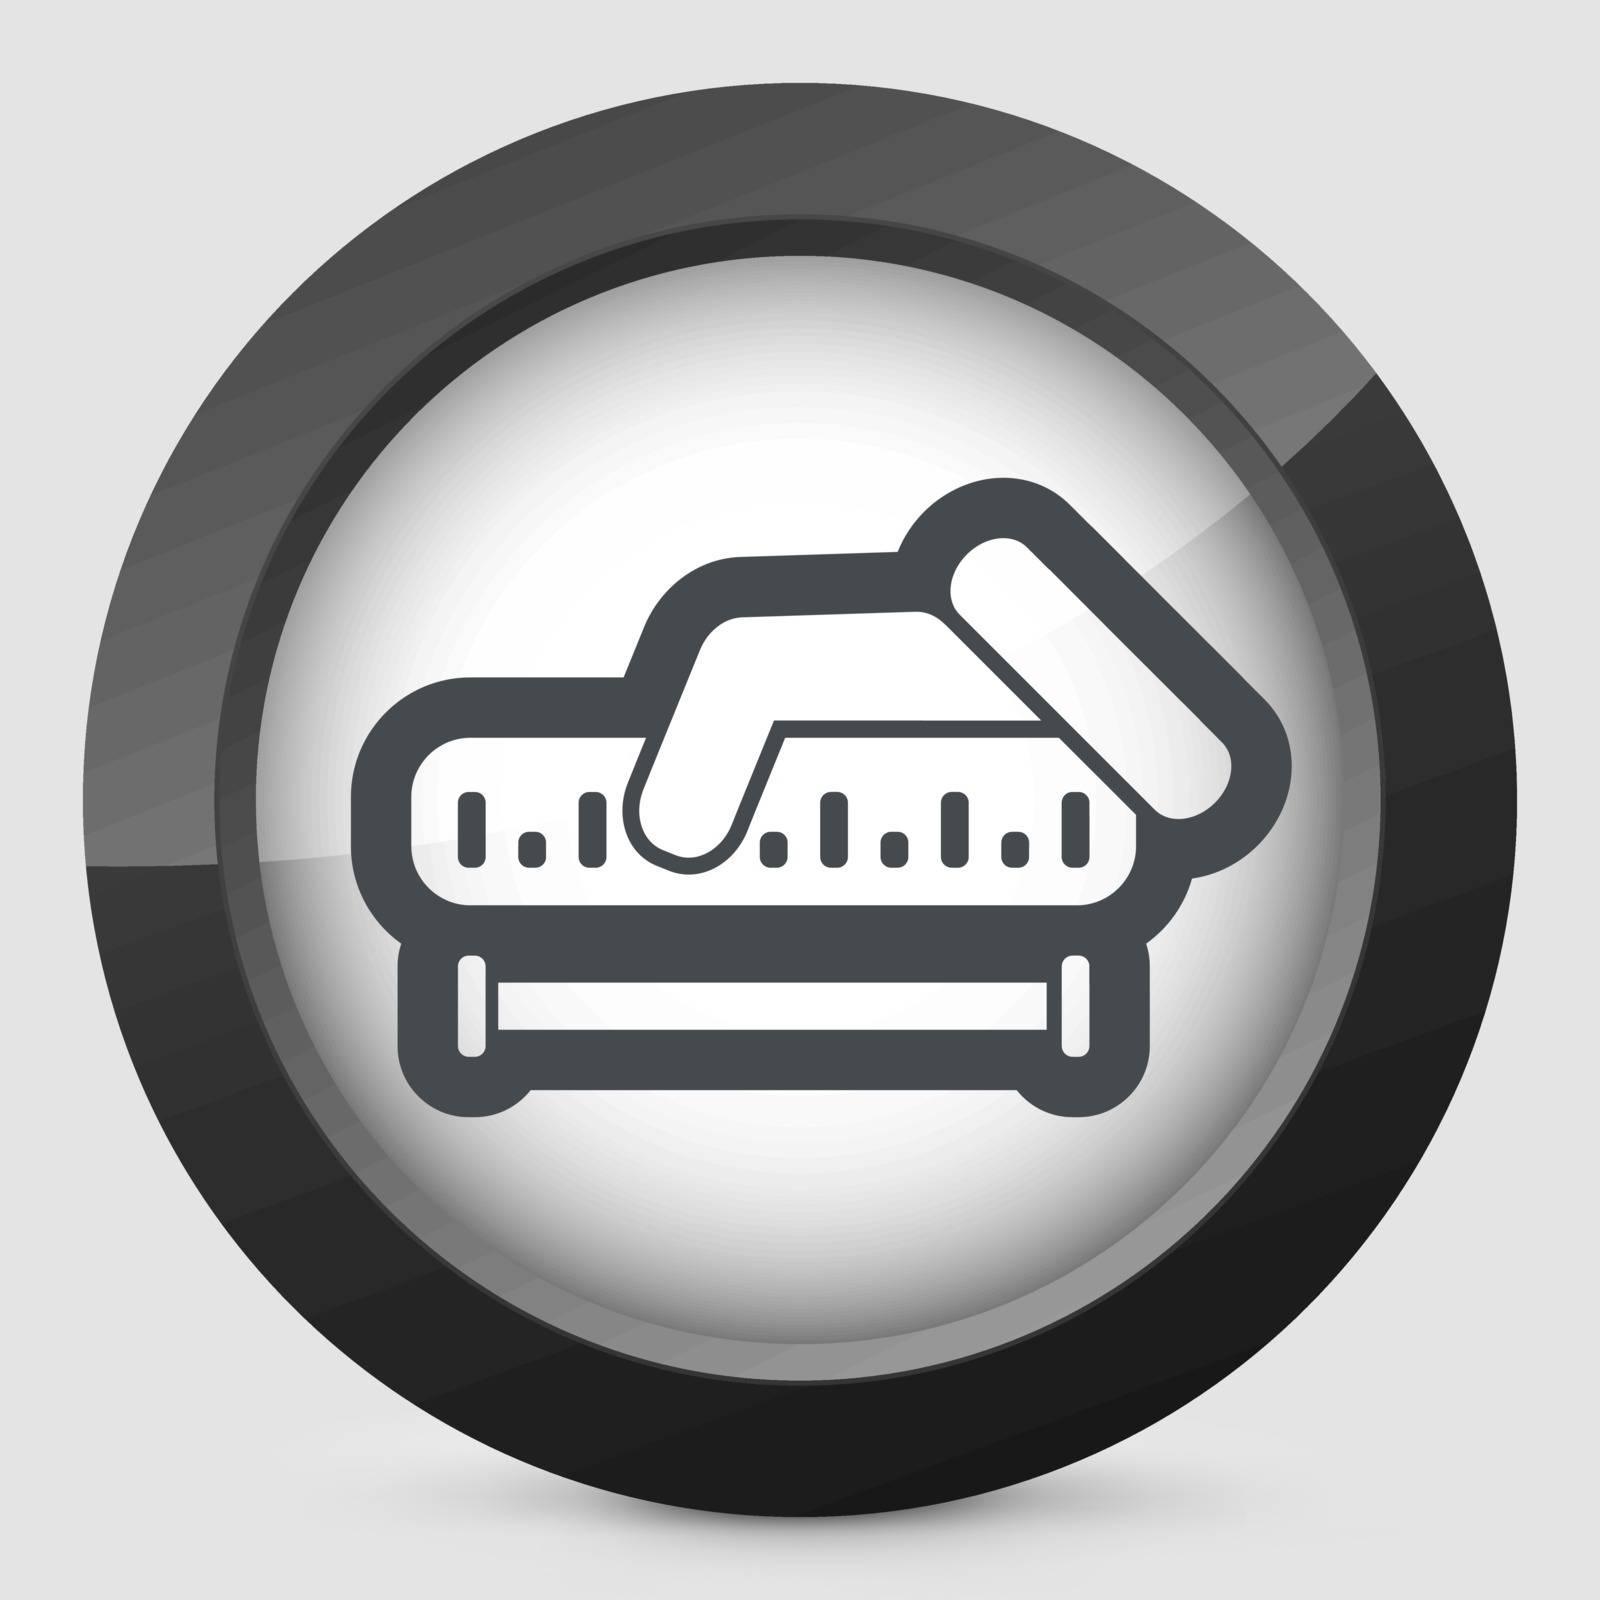 Measurement icon by myVector